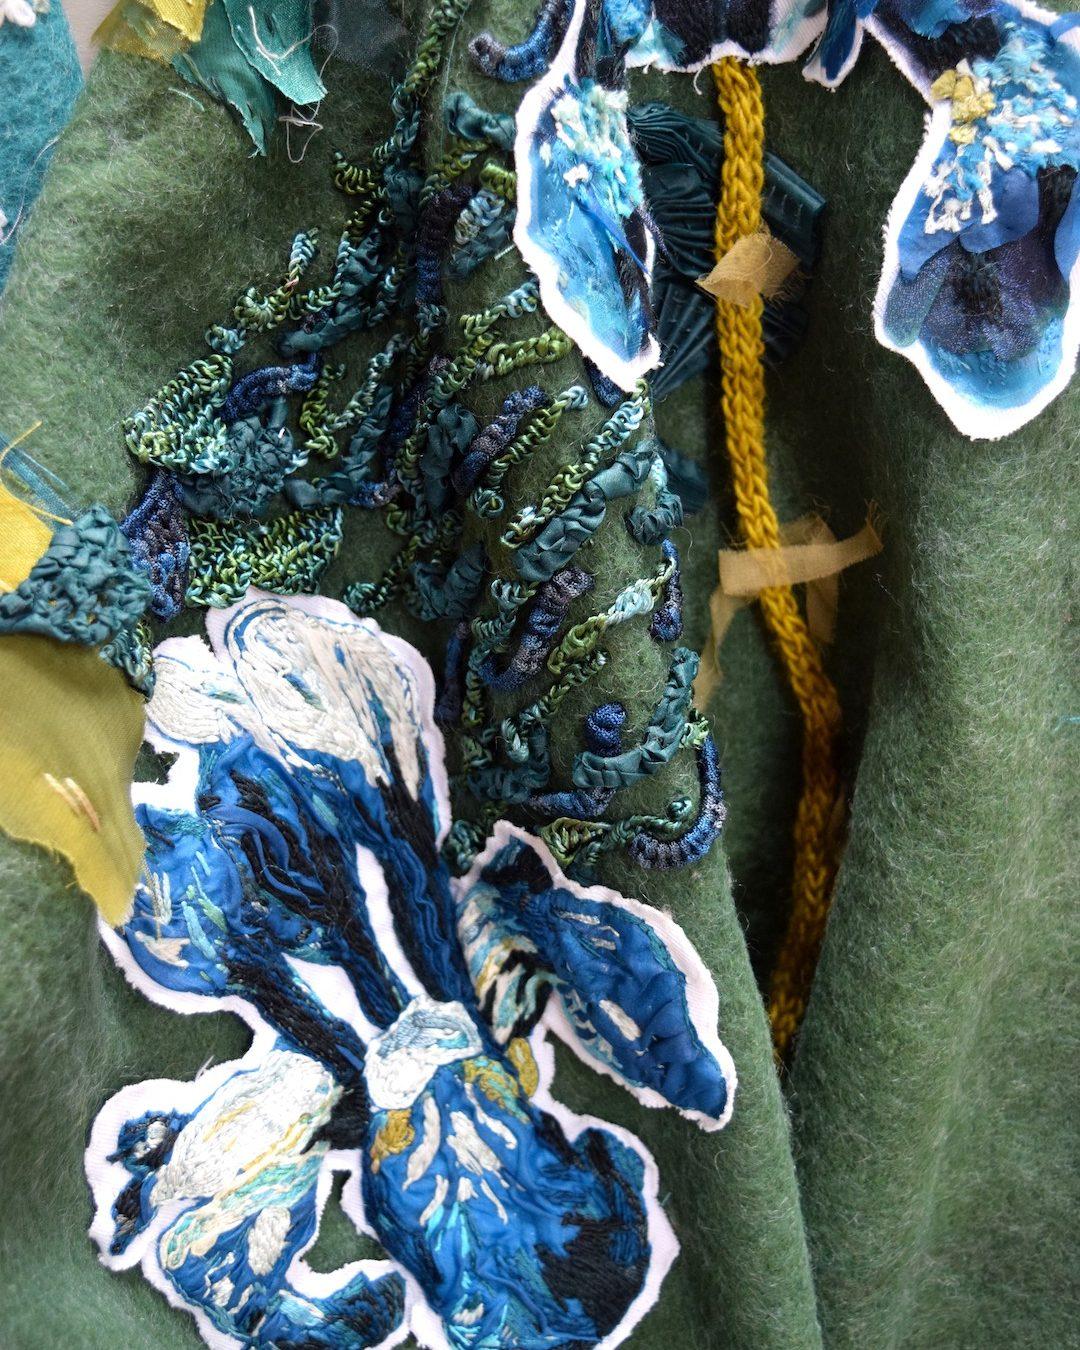 Into The Graden Formal Garden Blanket Embroidery 06